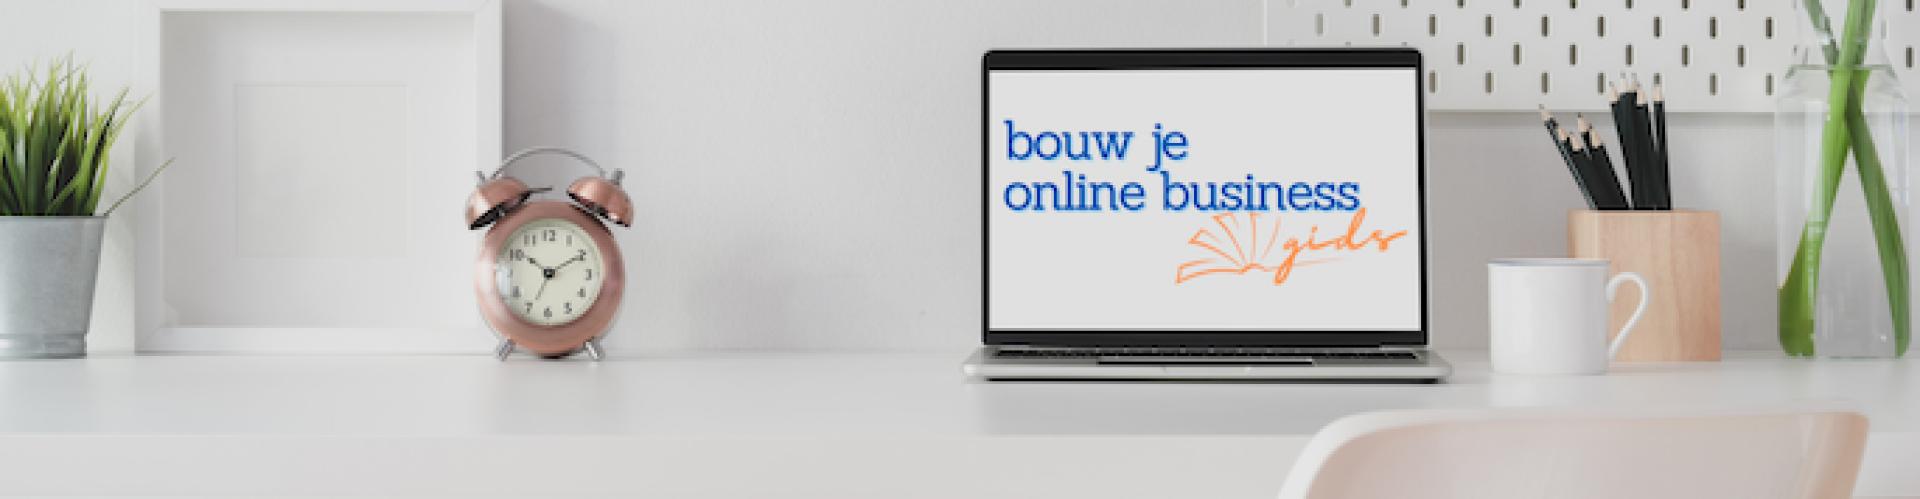 Bouw je online business gids